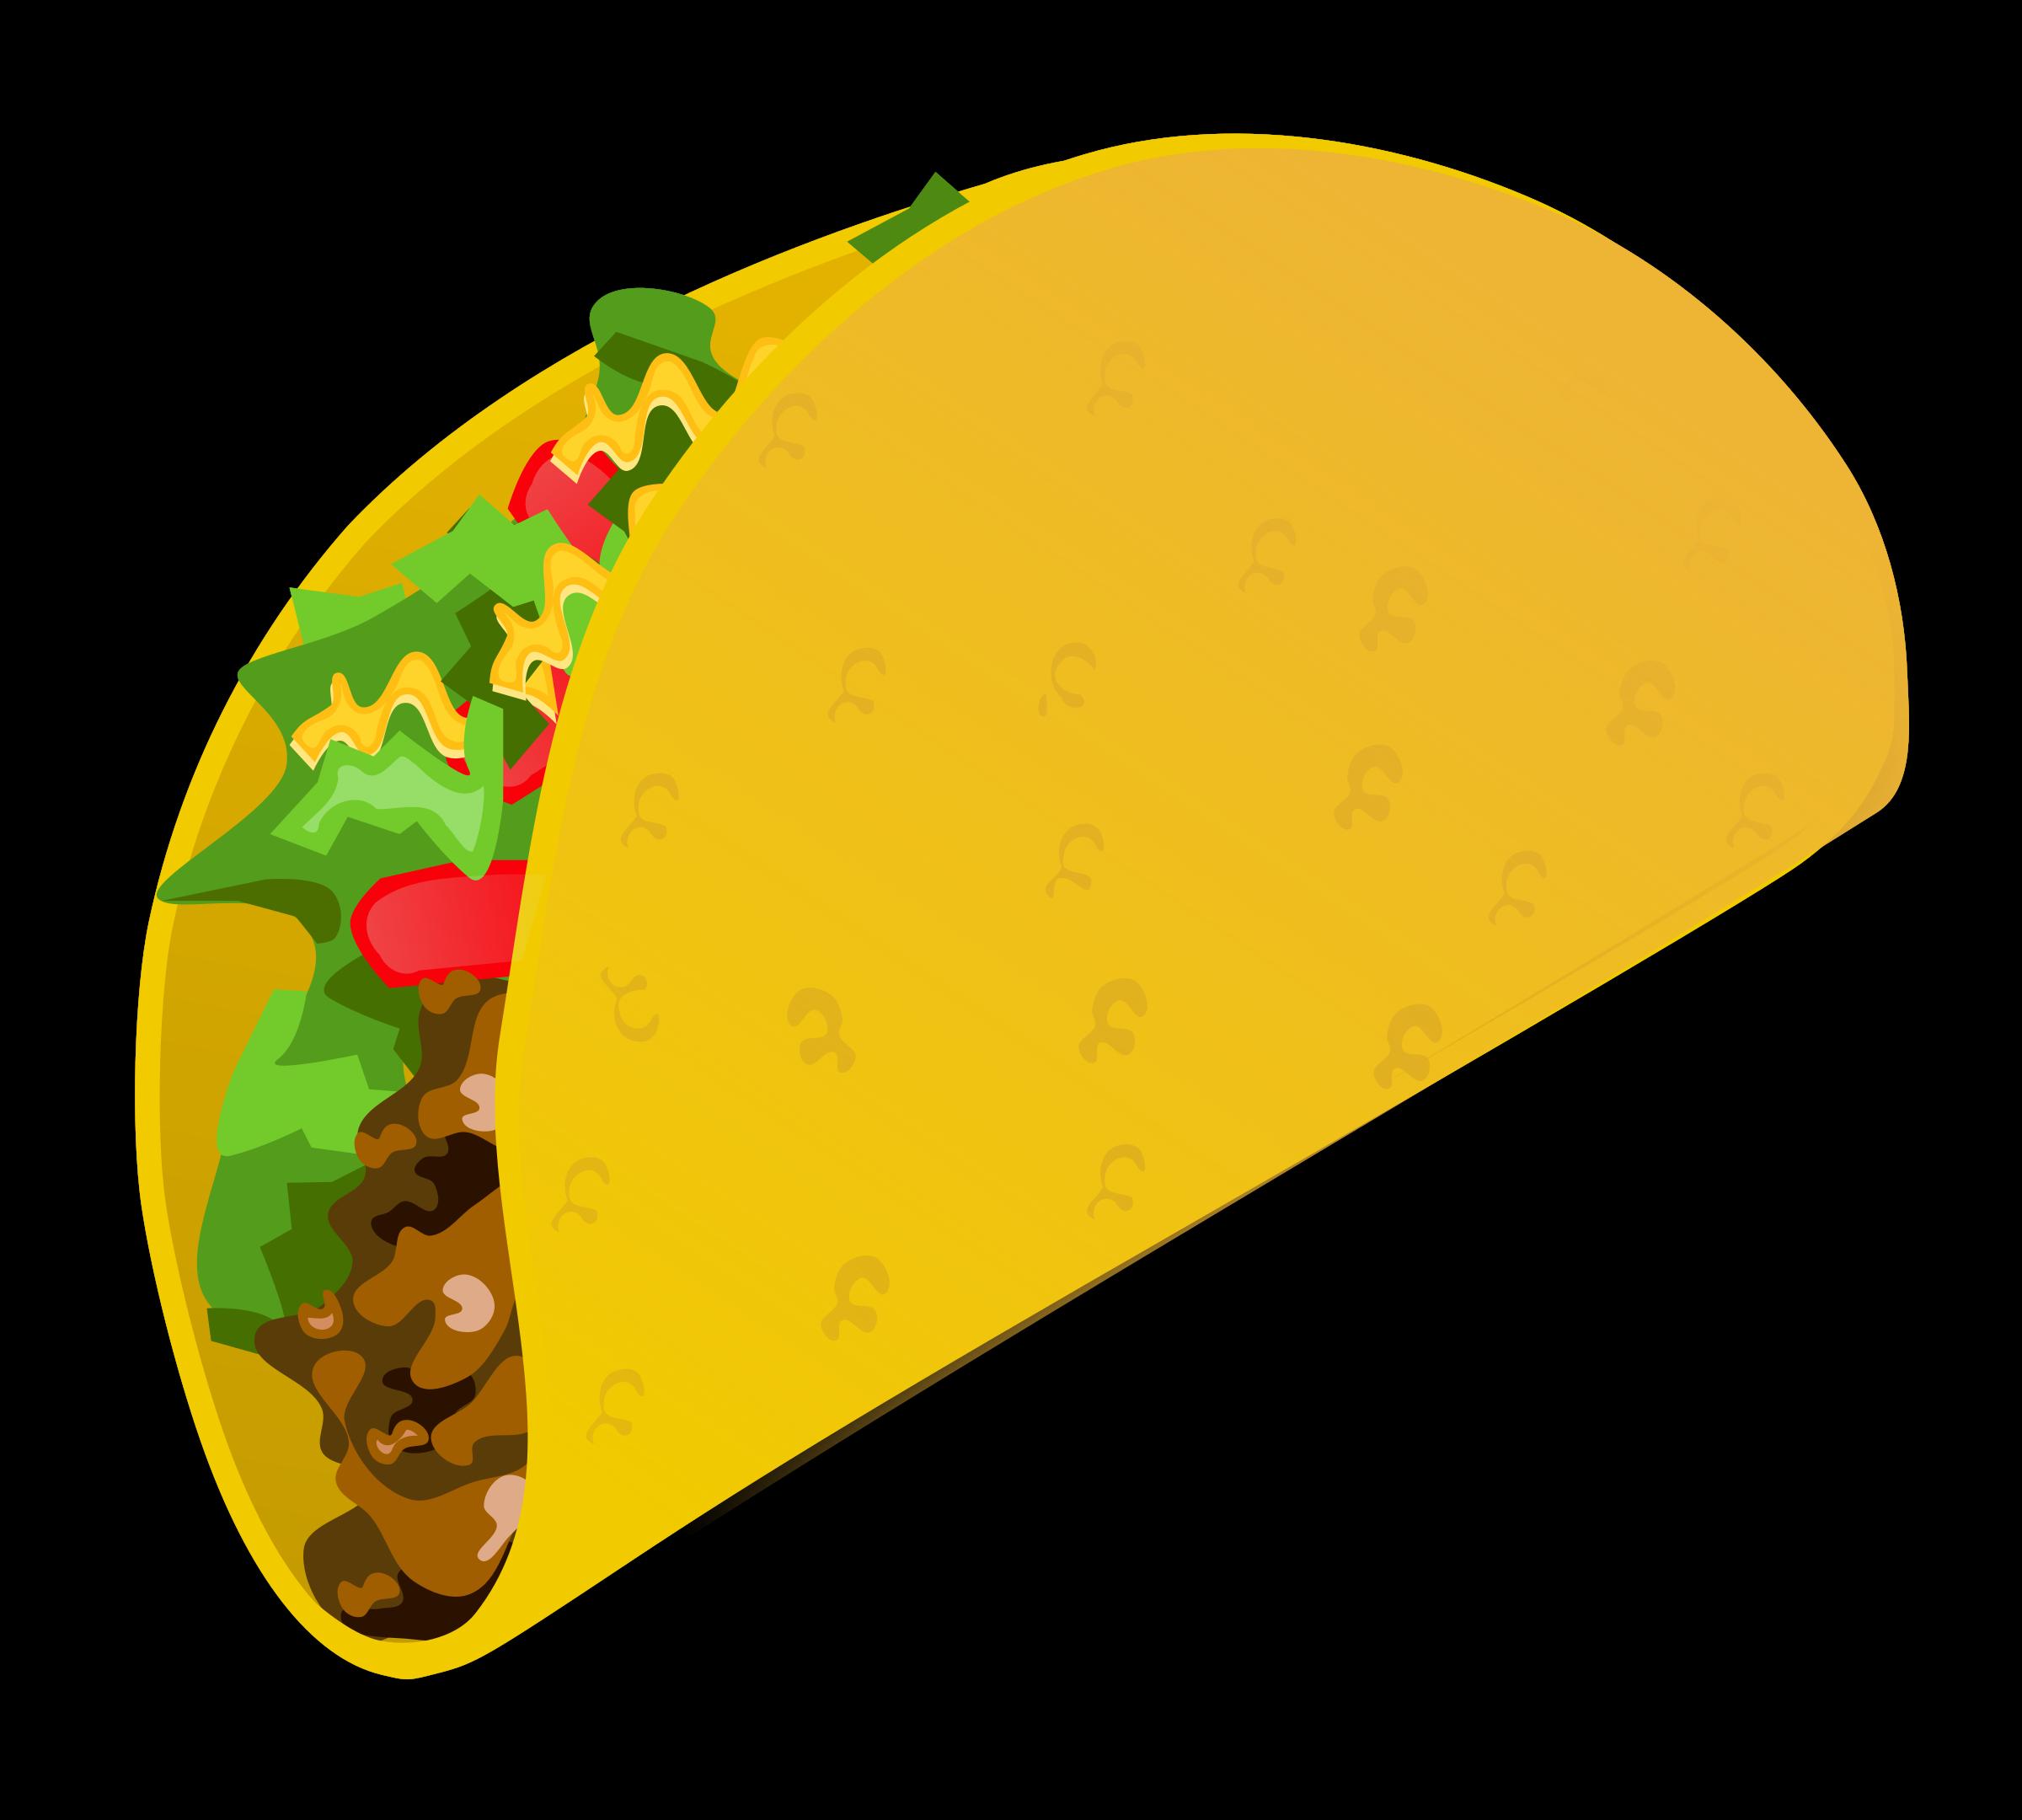 Spanish clipart taco Taco com Clipart Favorite 9618